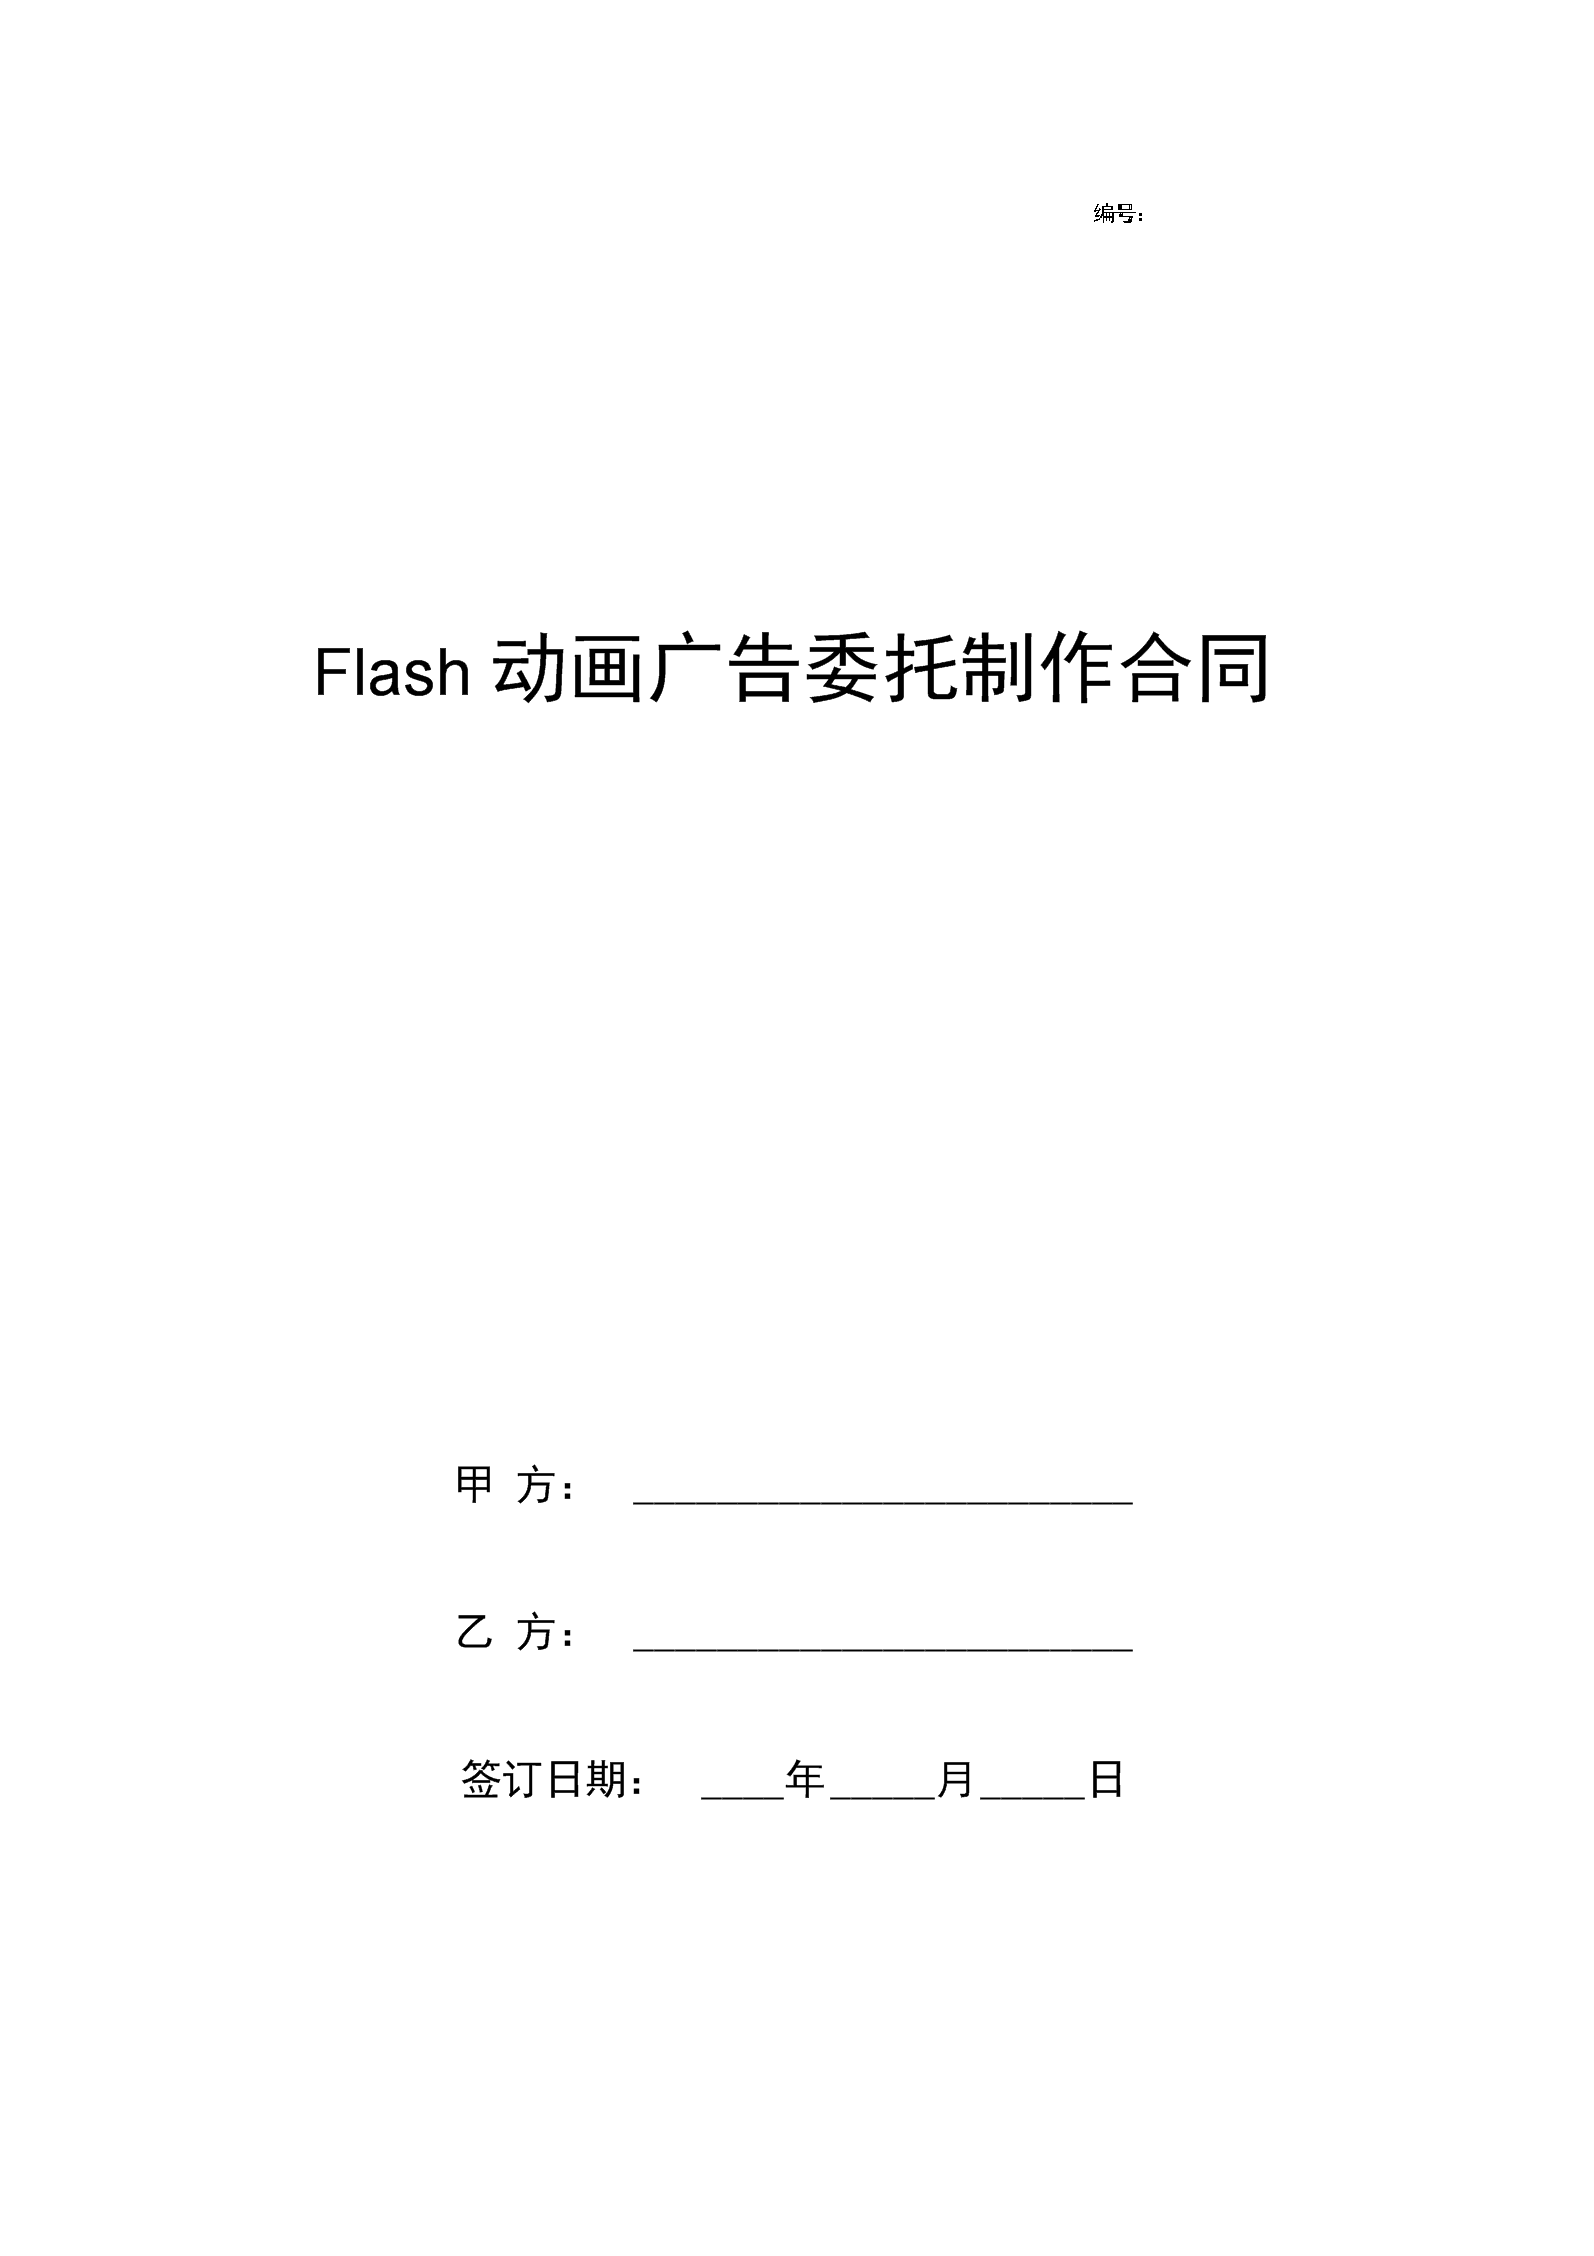 flash动画广告委托制作合同协议书范本标准版0001.docx